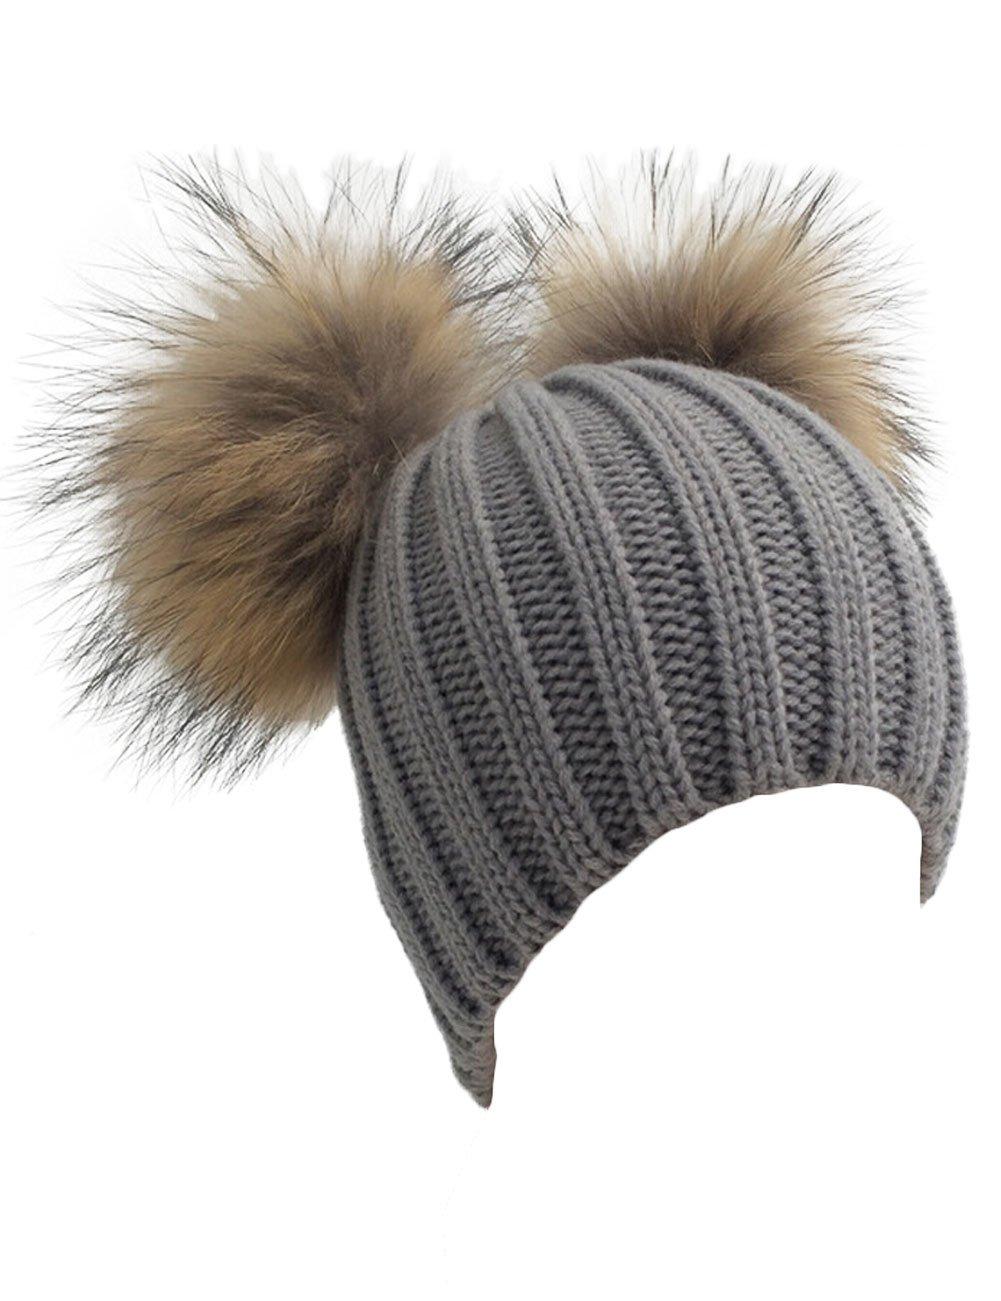 XWDA Women's Knitted Raccoon Fur Double Pom Beanie Hat (Gray)